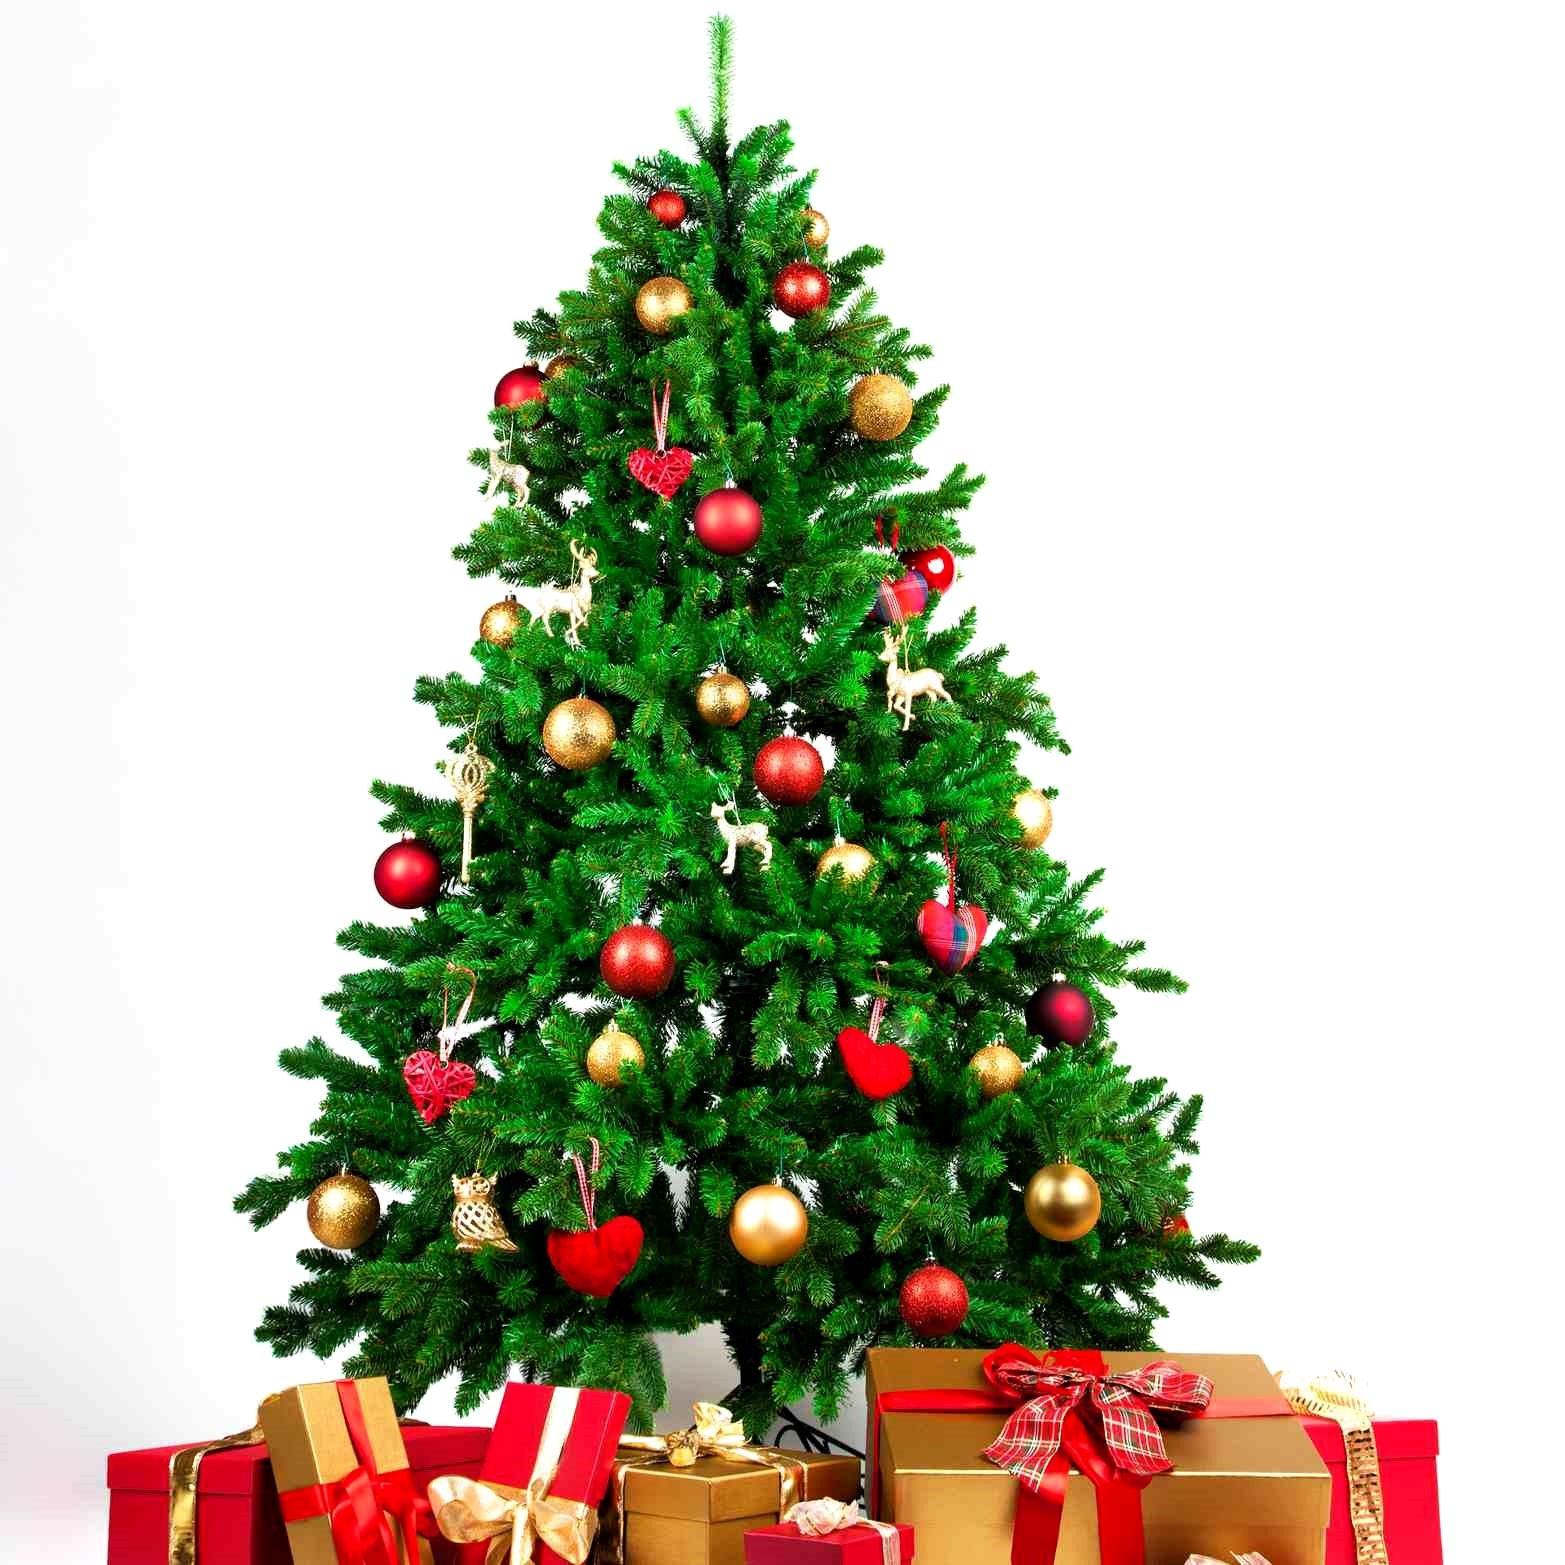 Buy A Christmas Tree Near Me Gallery di 2020